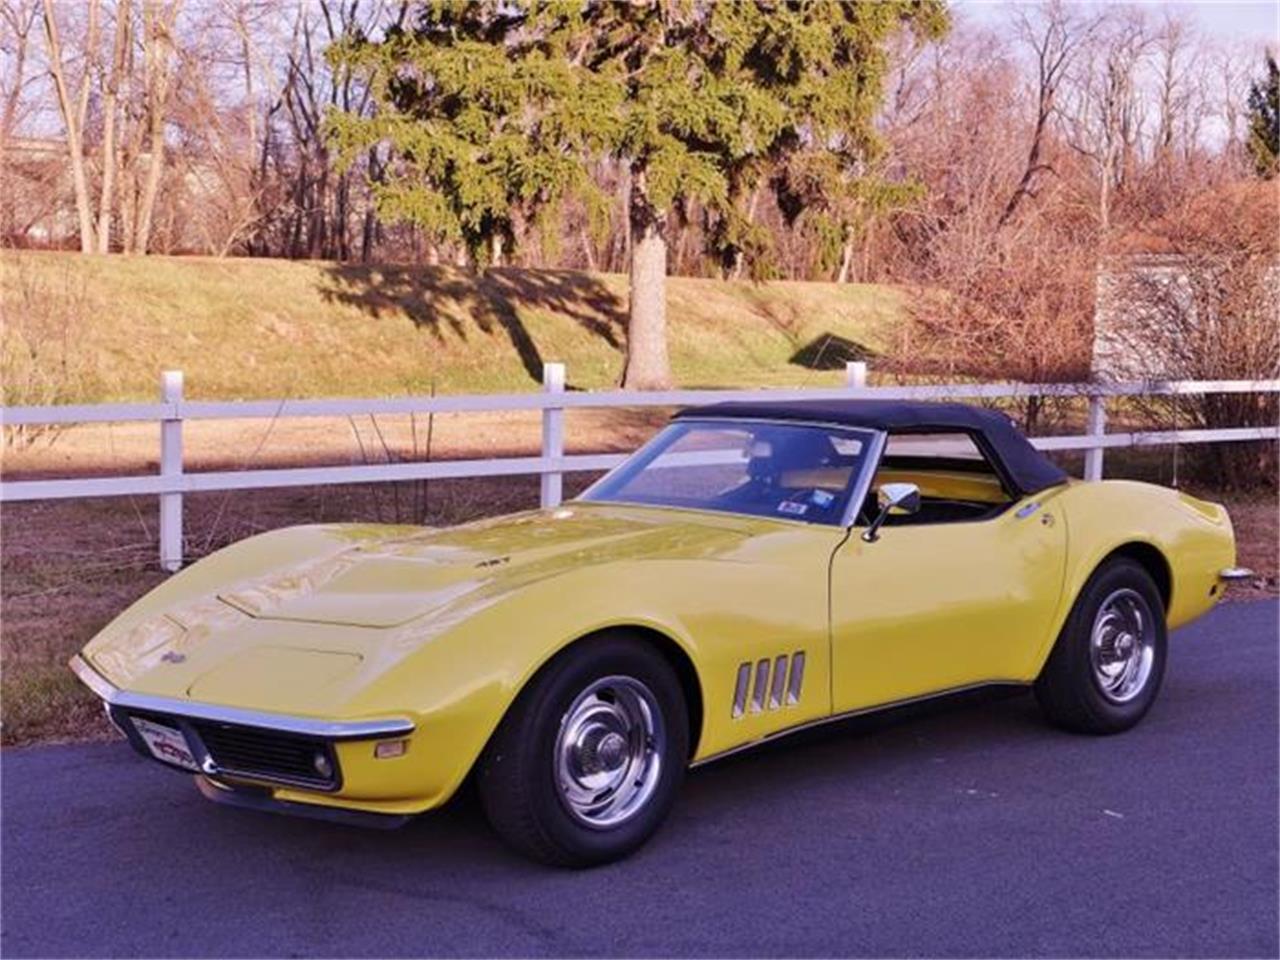 1968 Chevrolet Corvette (CC-637791) for sale in Old Forge, Pennsylvania